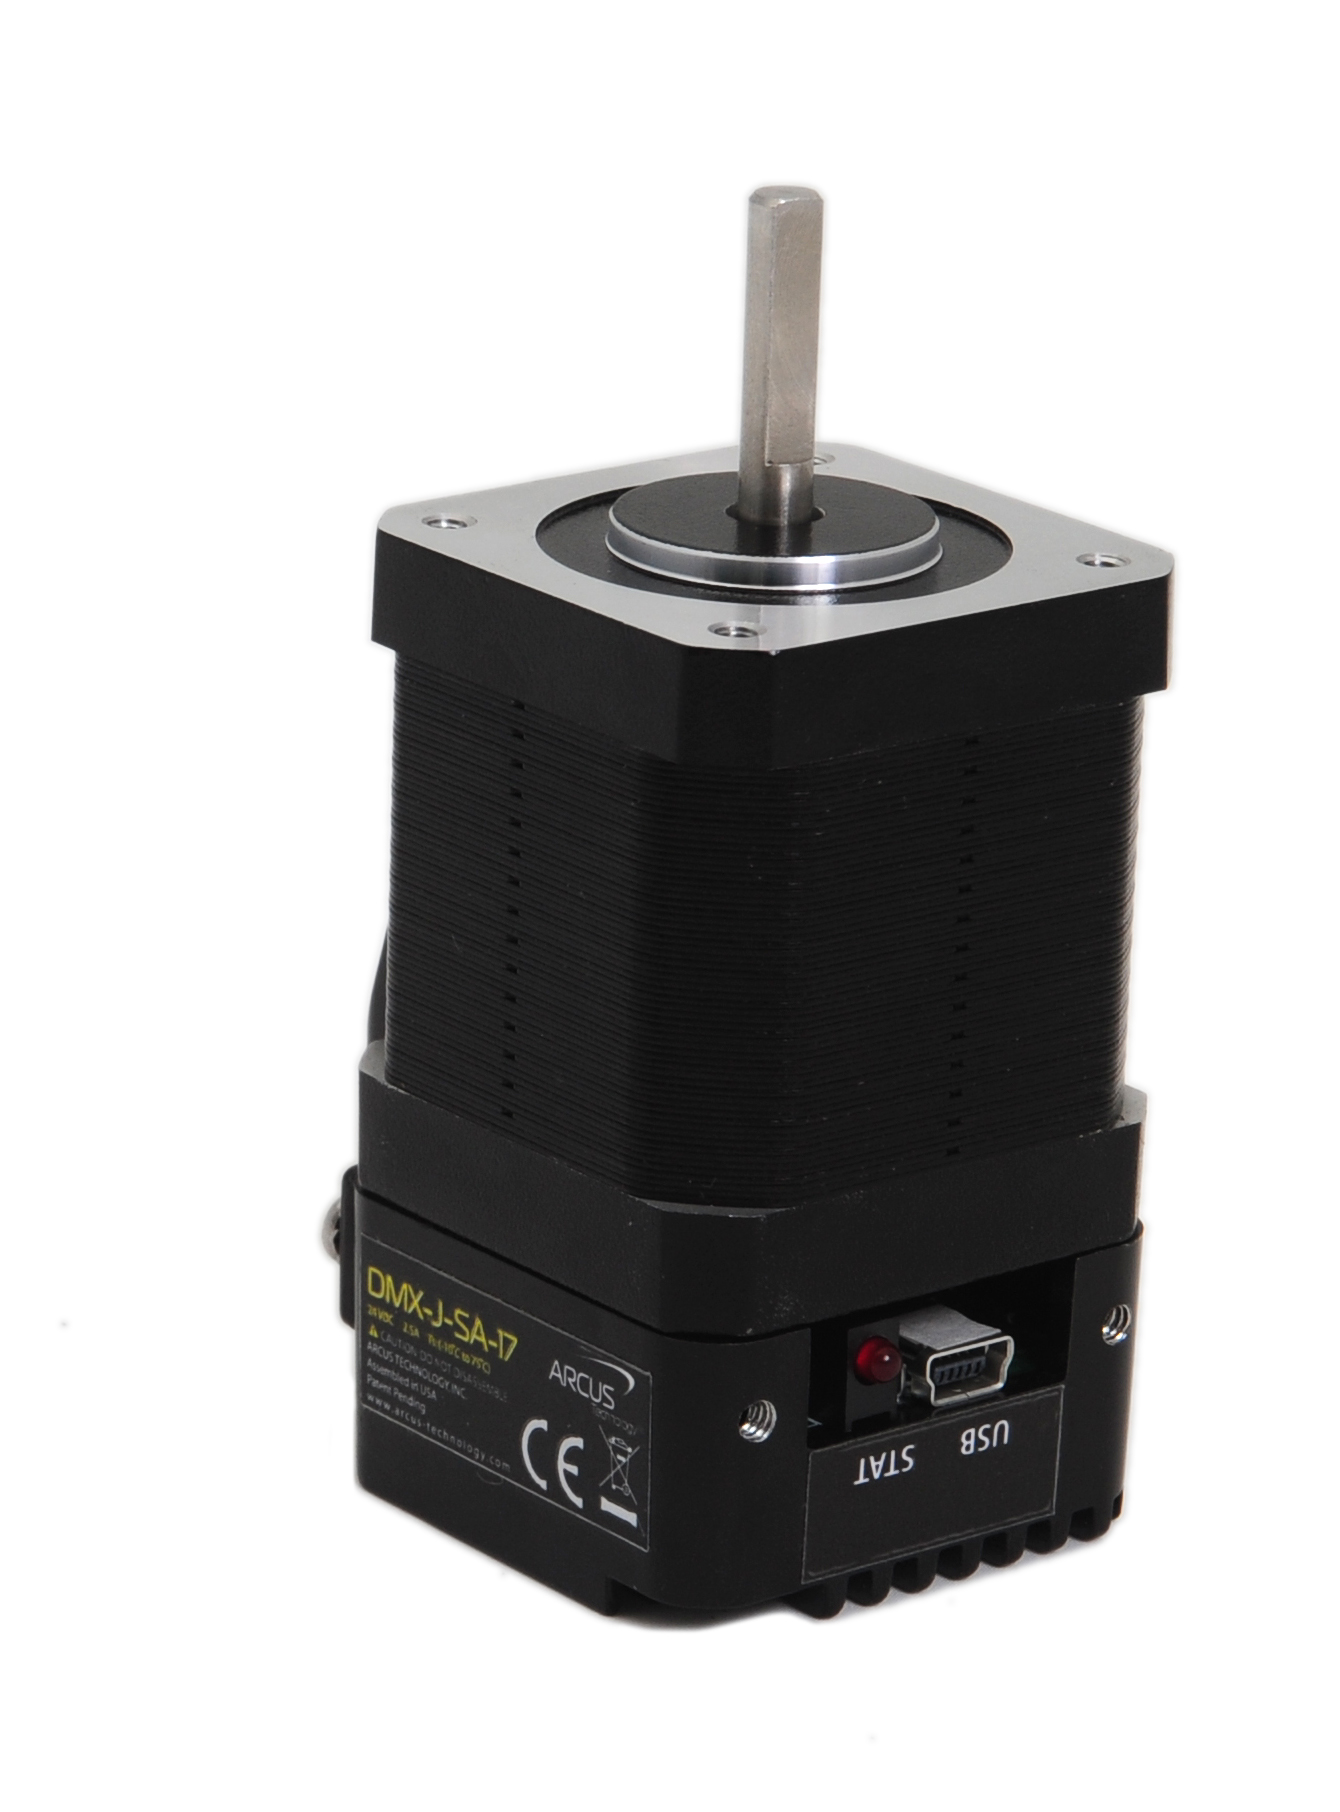 Nema 17 usb stepper motor arcus technology inc for Stepper motor integrated controller